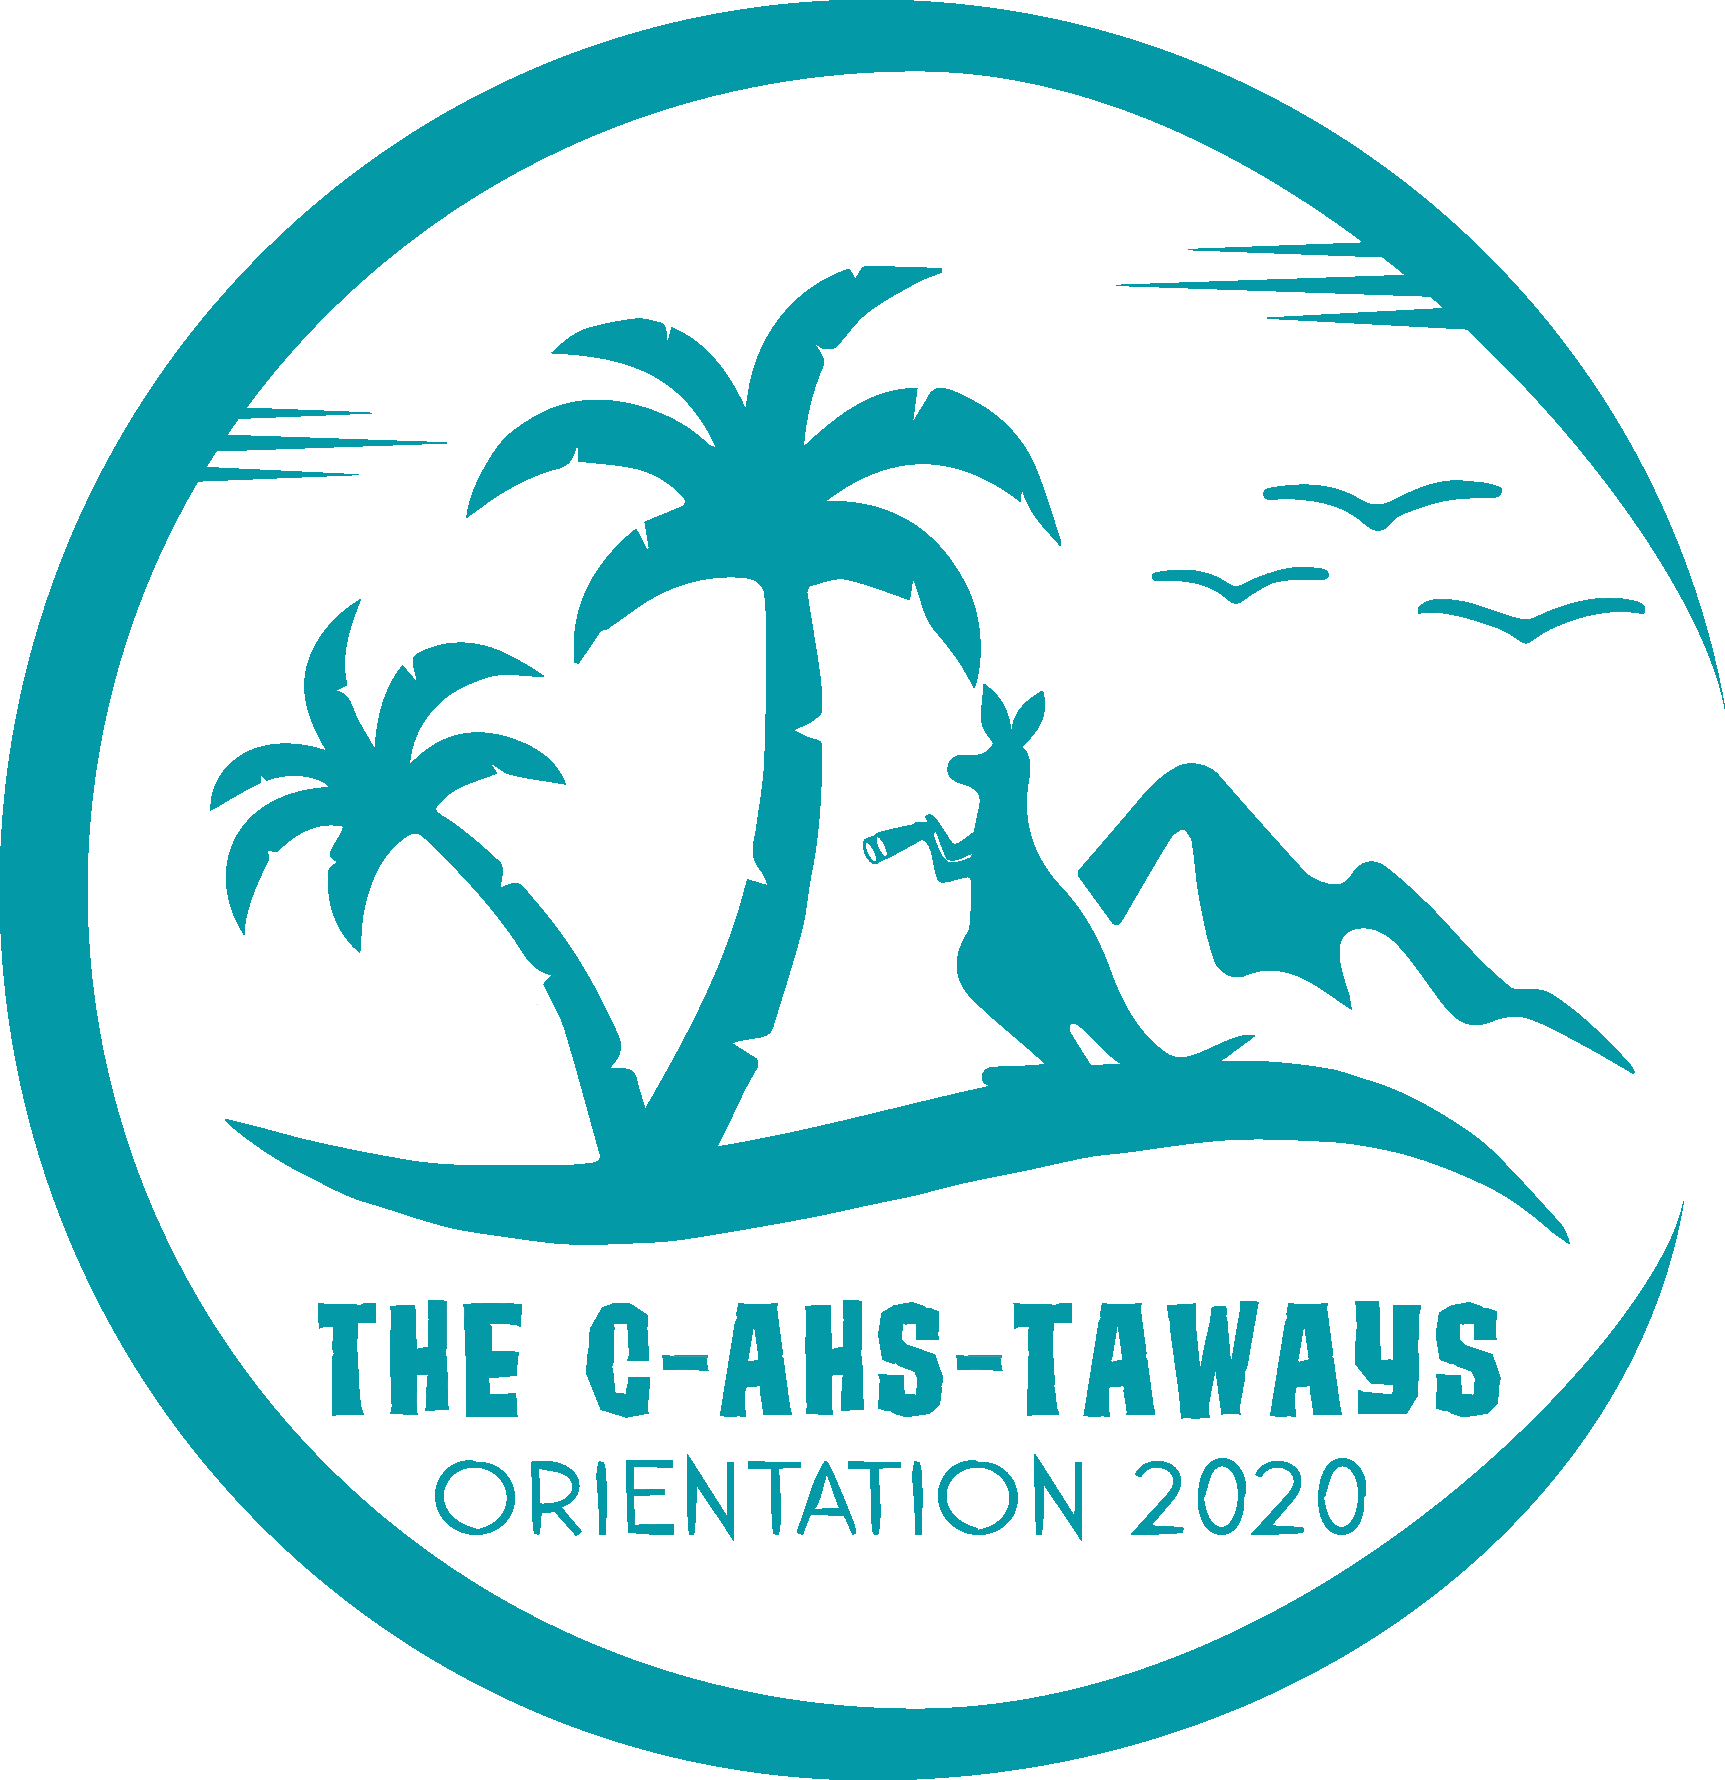 C-AHS-TAWAYS logo